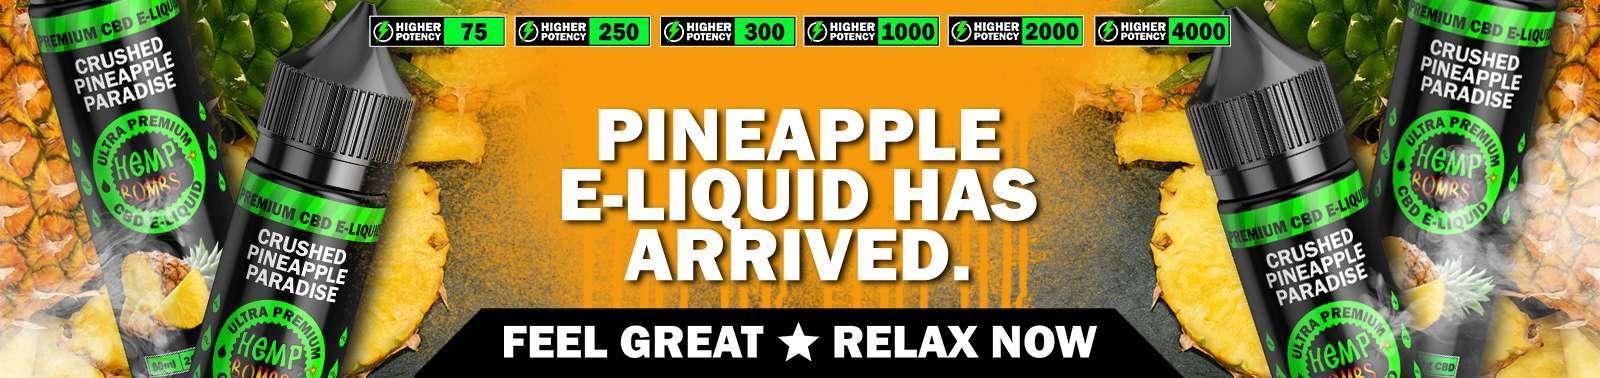 CBD Vape E-Liquid Pineapple